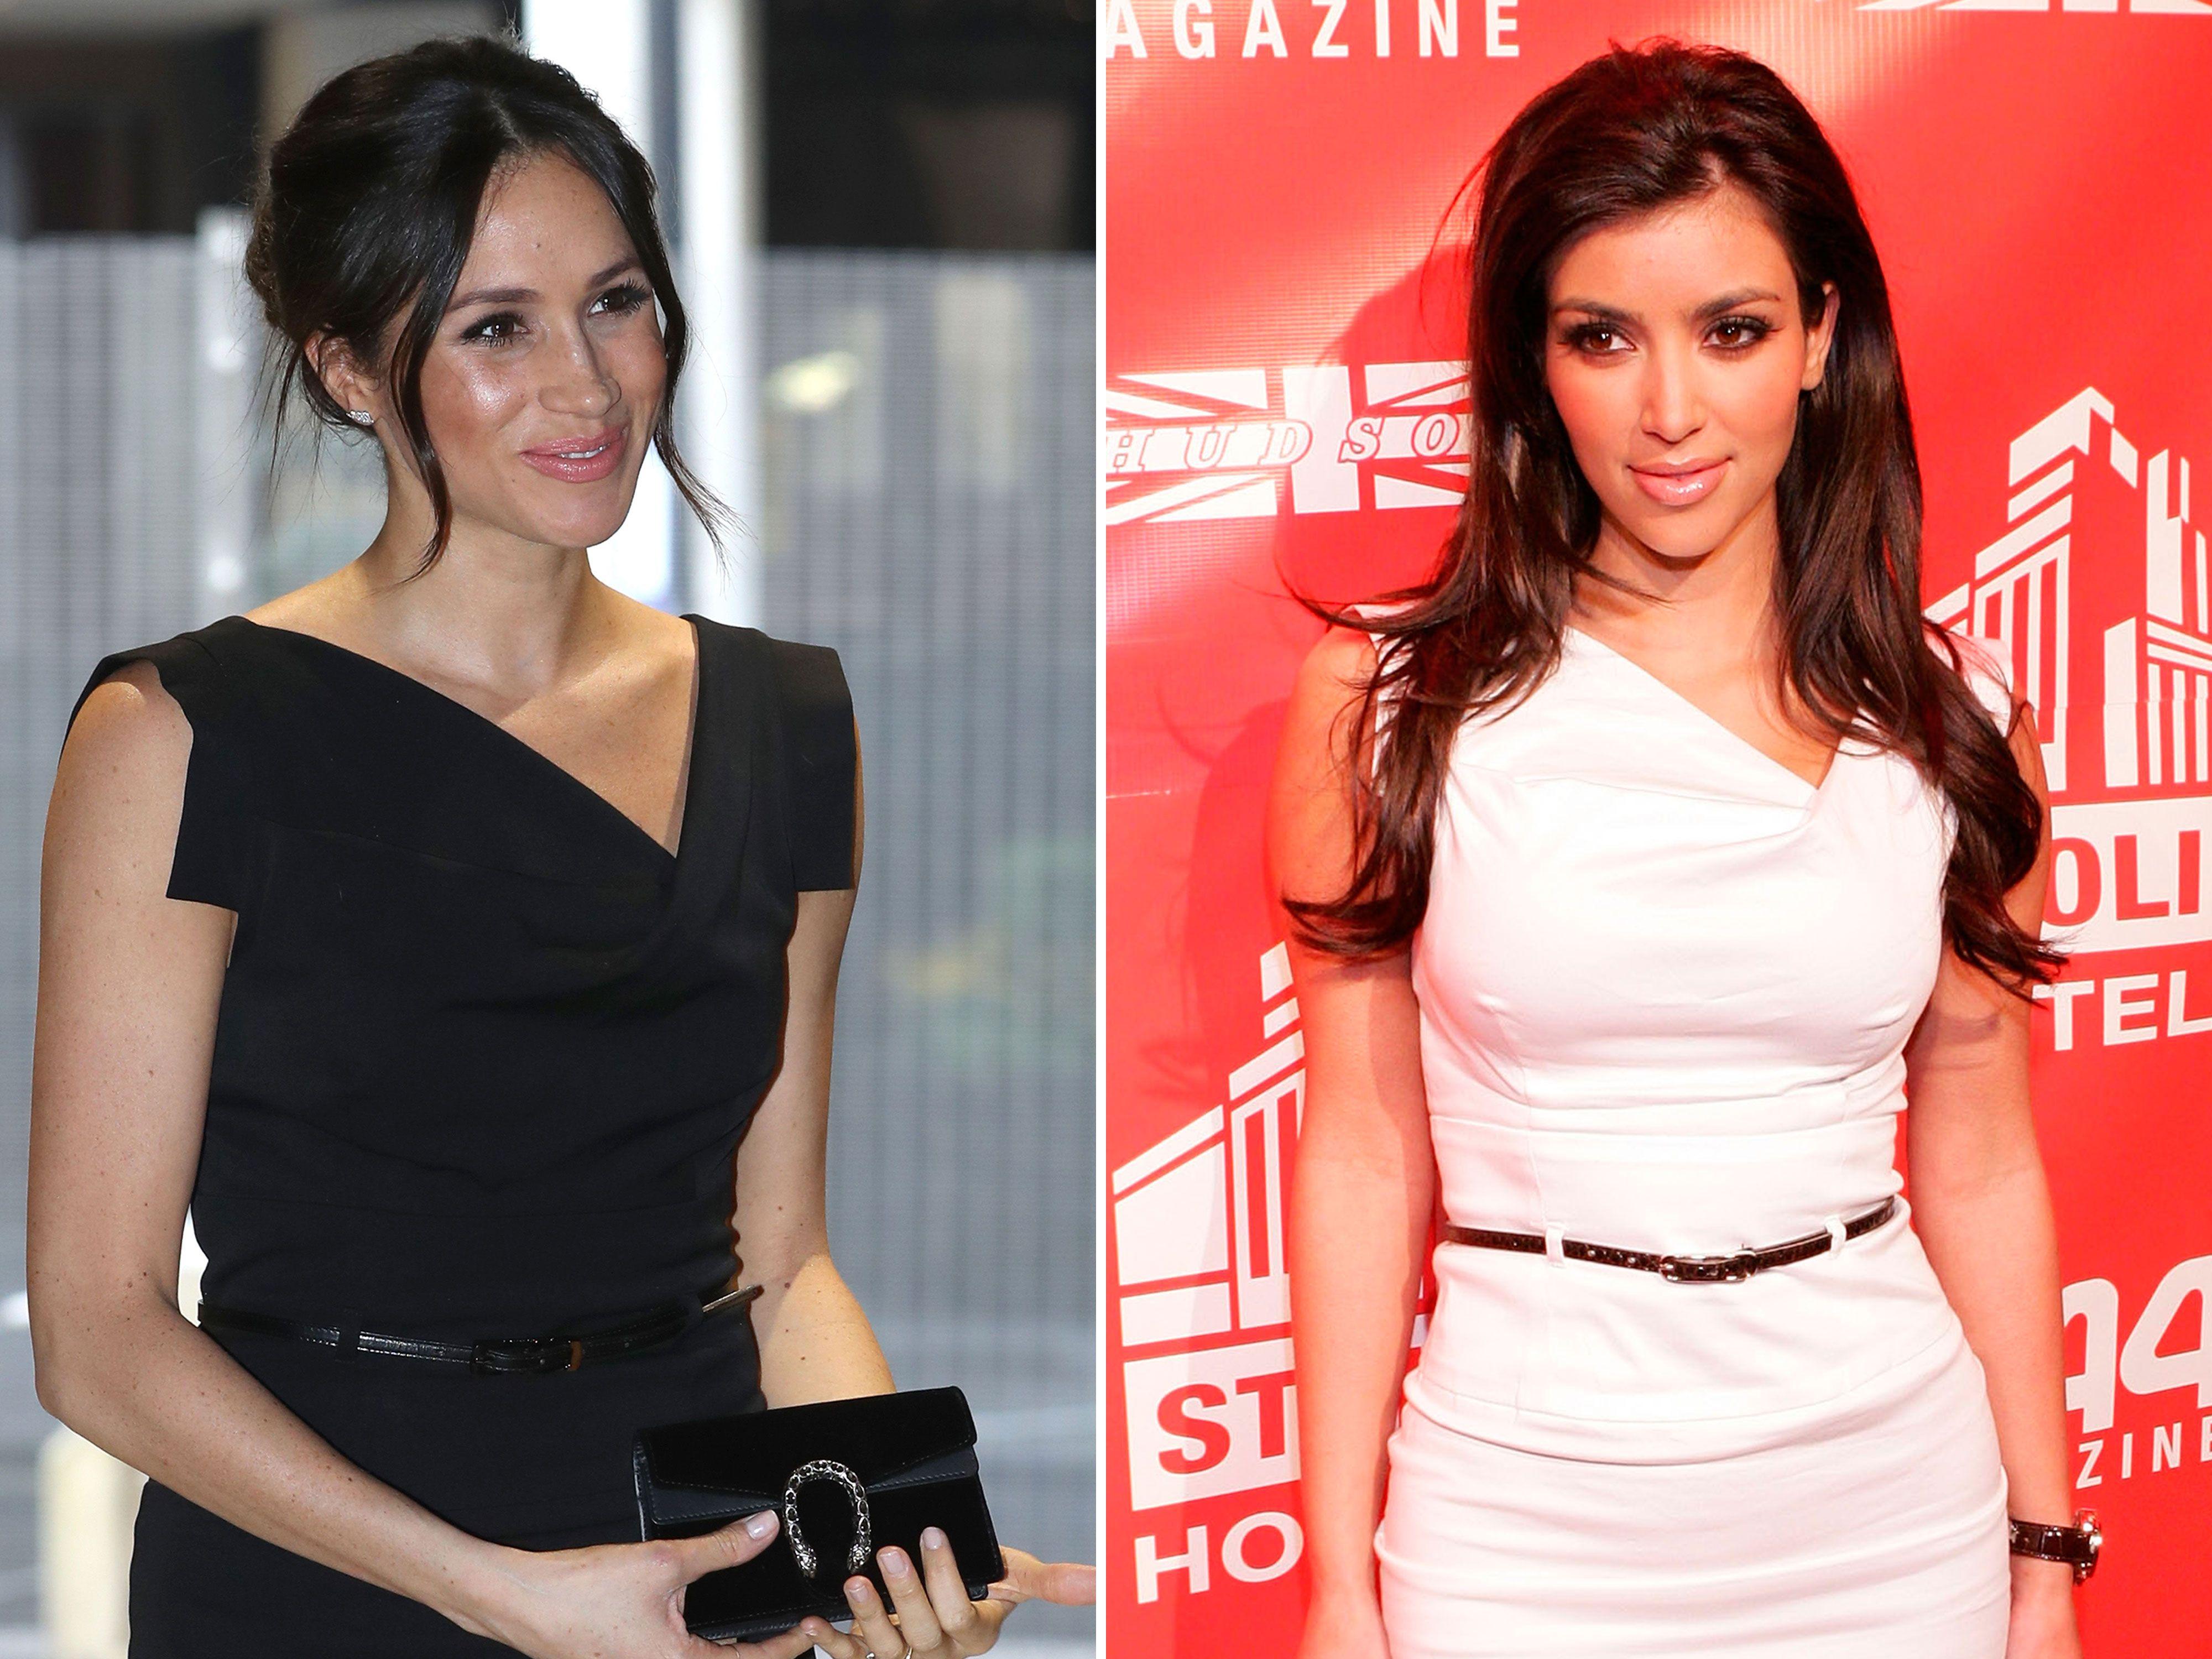 Meghan Markle wore the same dress as Kim Kardashian did in 2007 ...